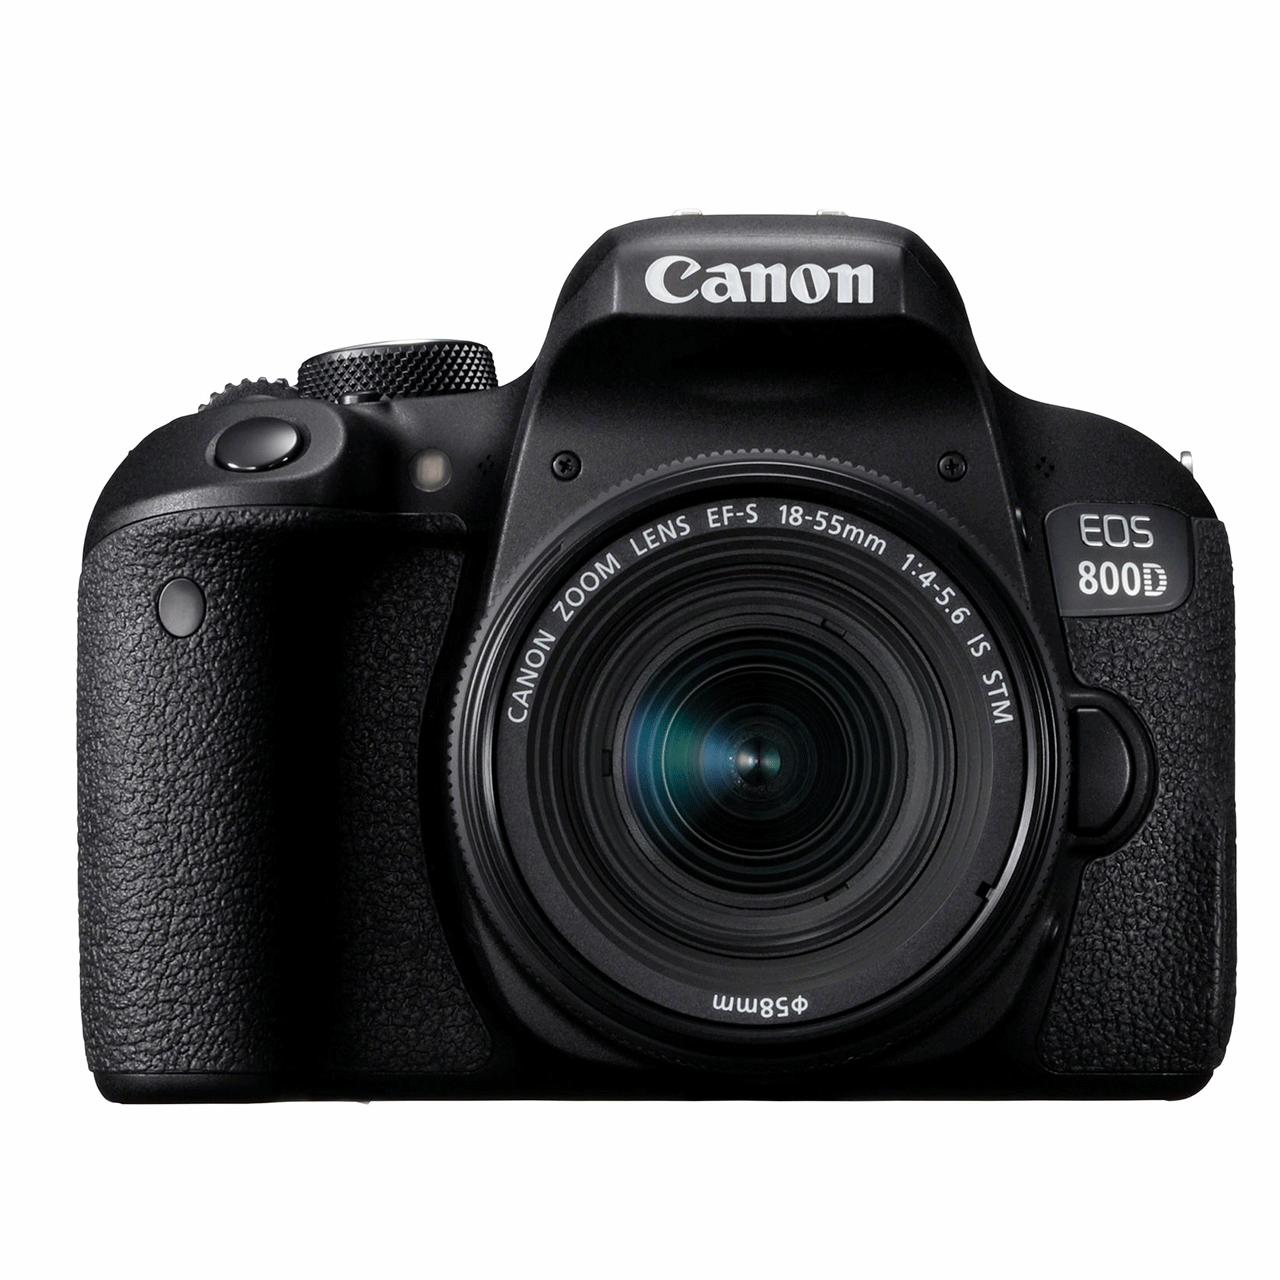 دوربین دیجیتال کانن مدل EOS 800D به همراه لنز 18-55 میلی متر IS STM thumb